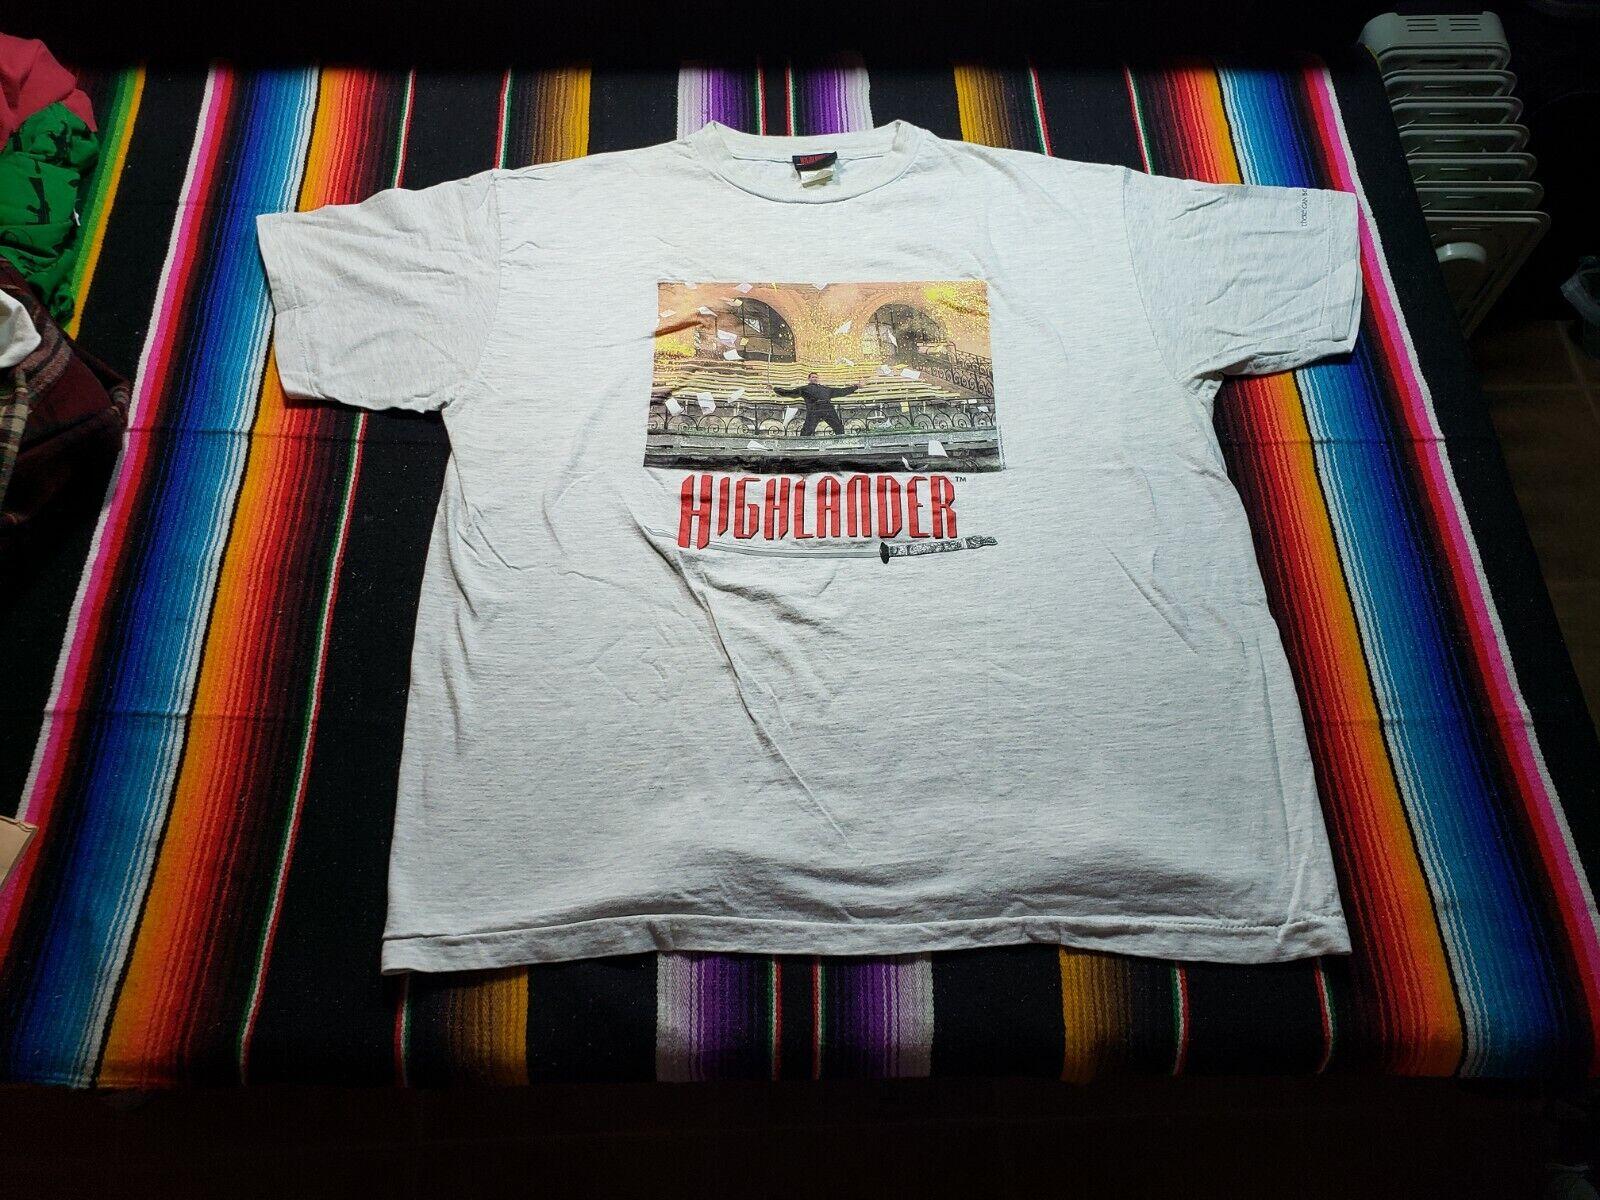 1997 Friends /'Central Perk/' vintage single-stitch grey t-shirt